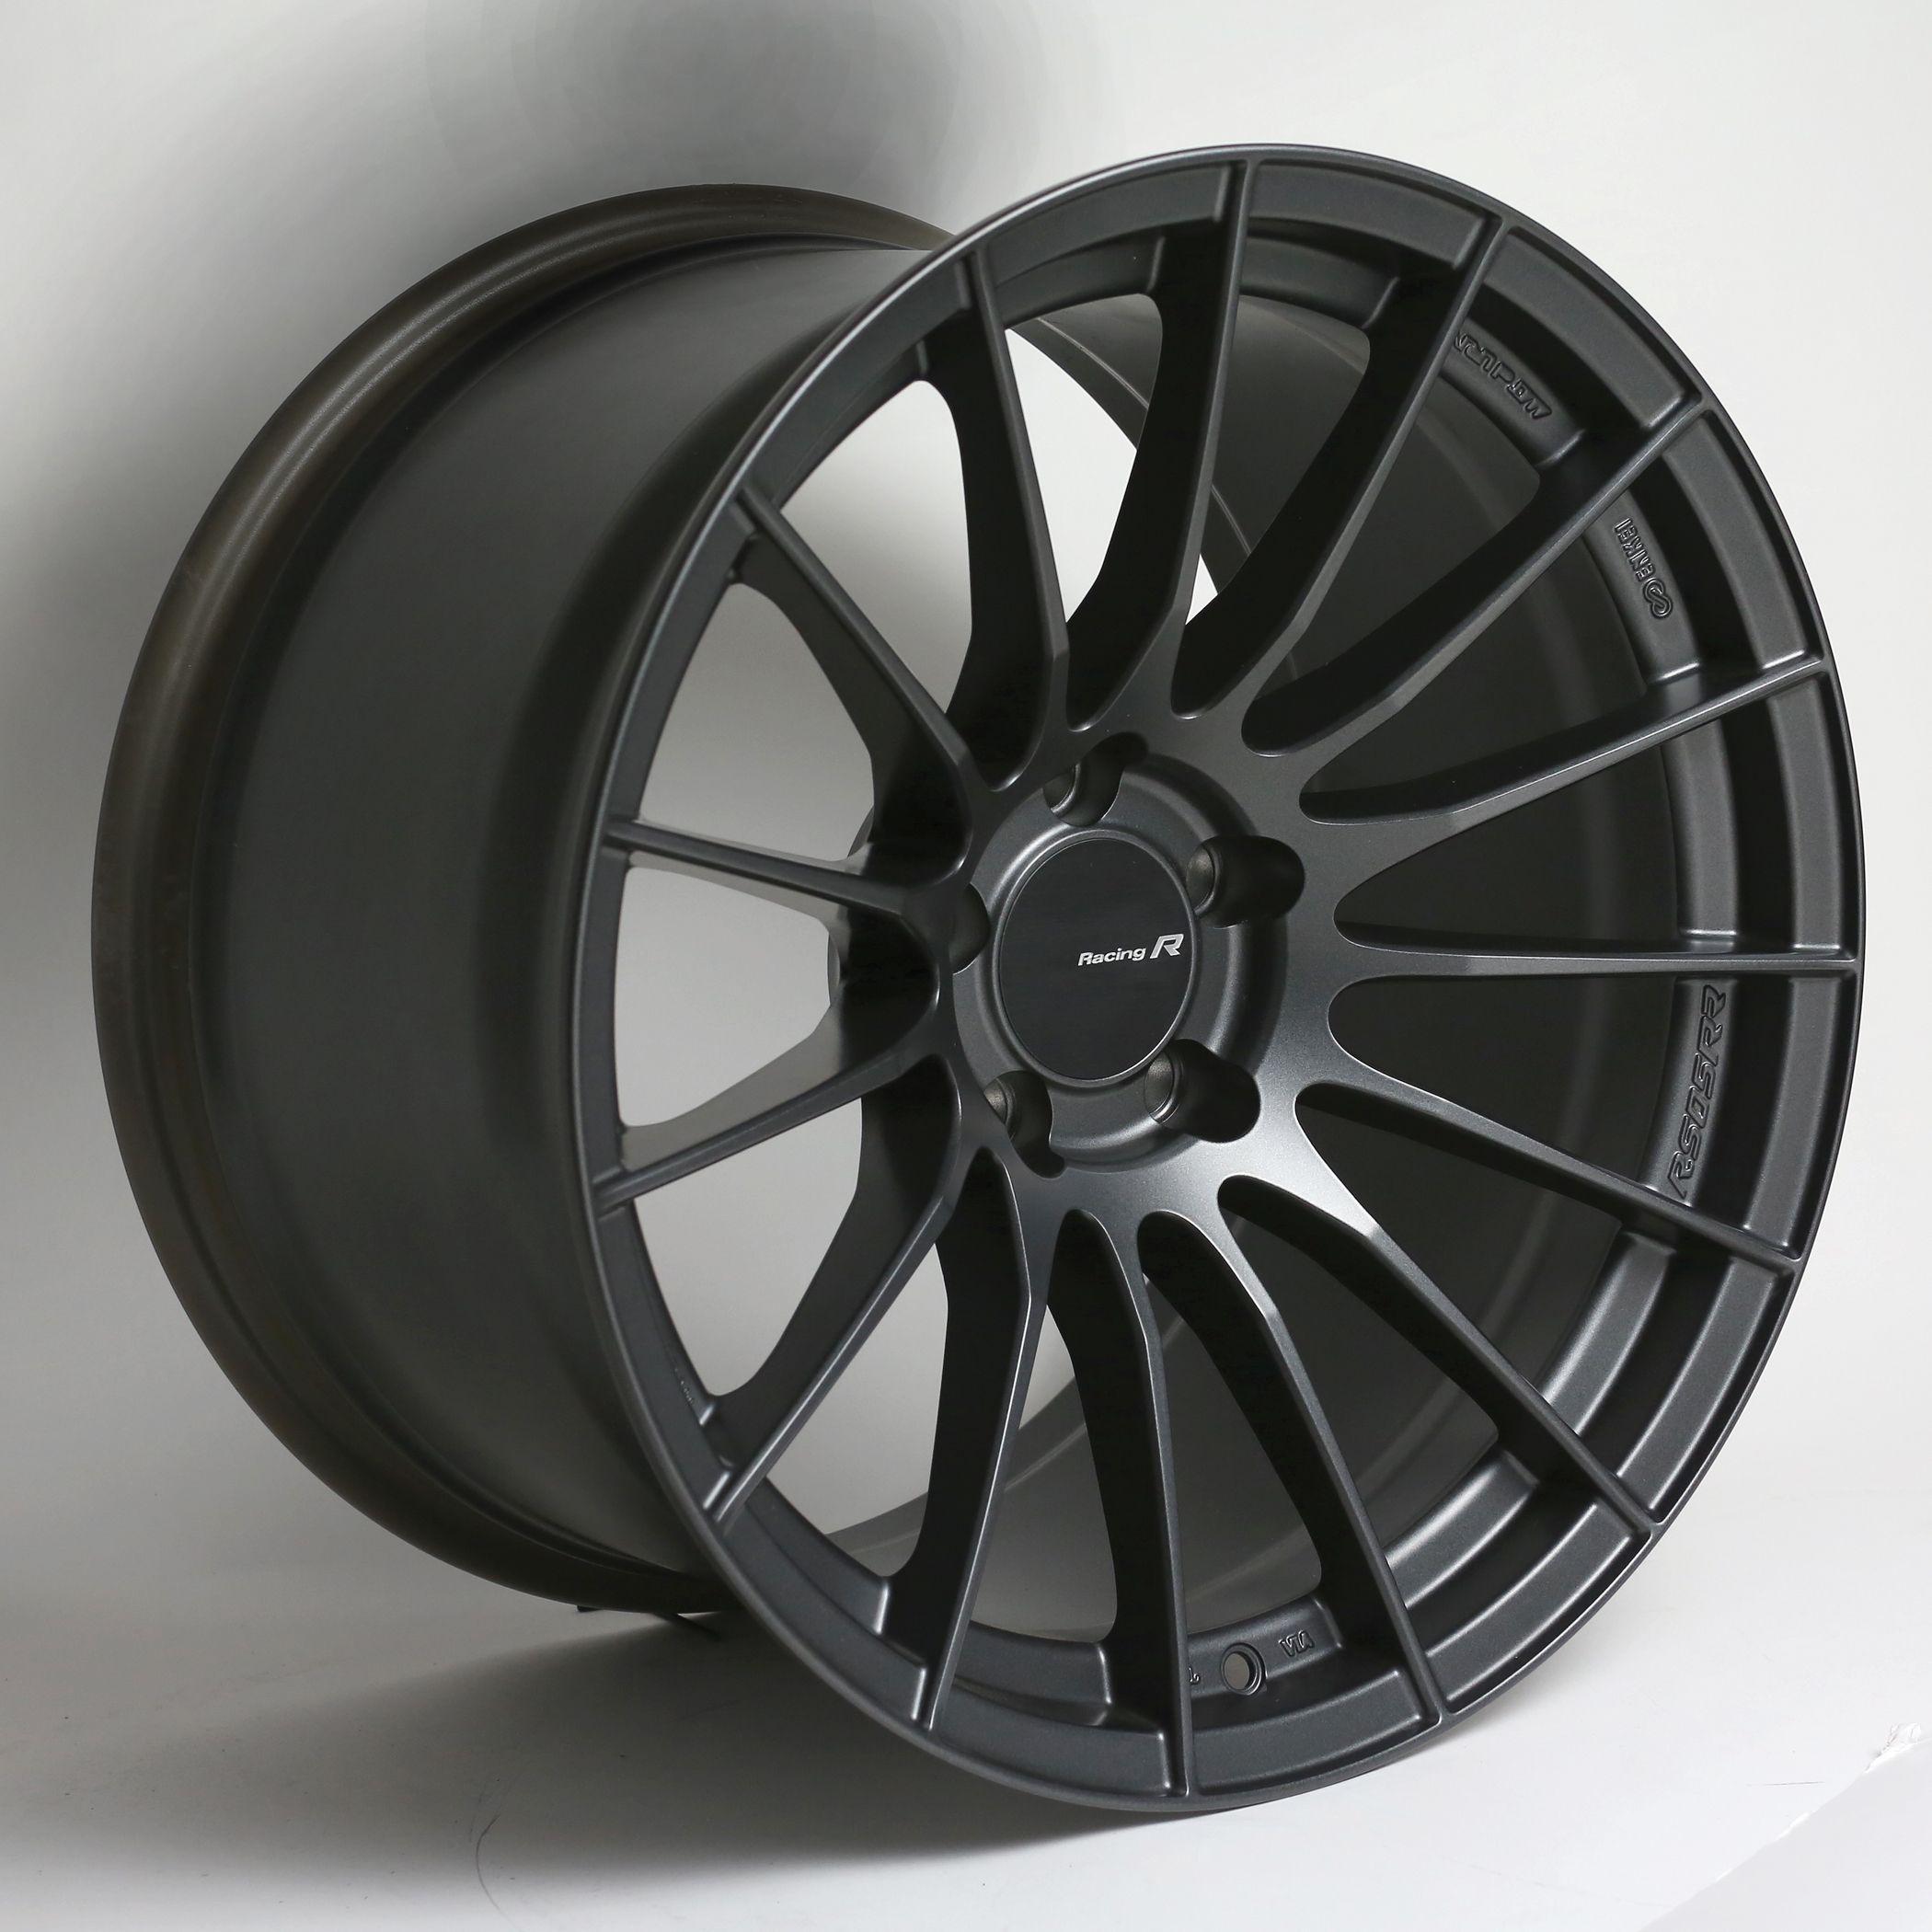 Enkei Rs05rr Wheel Rims Rims For Cars Aftermarket Wheels